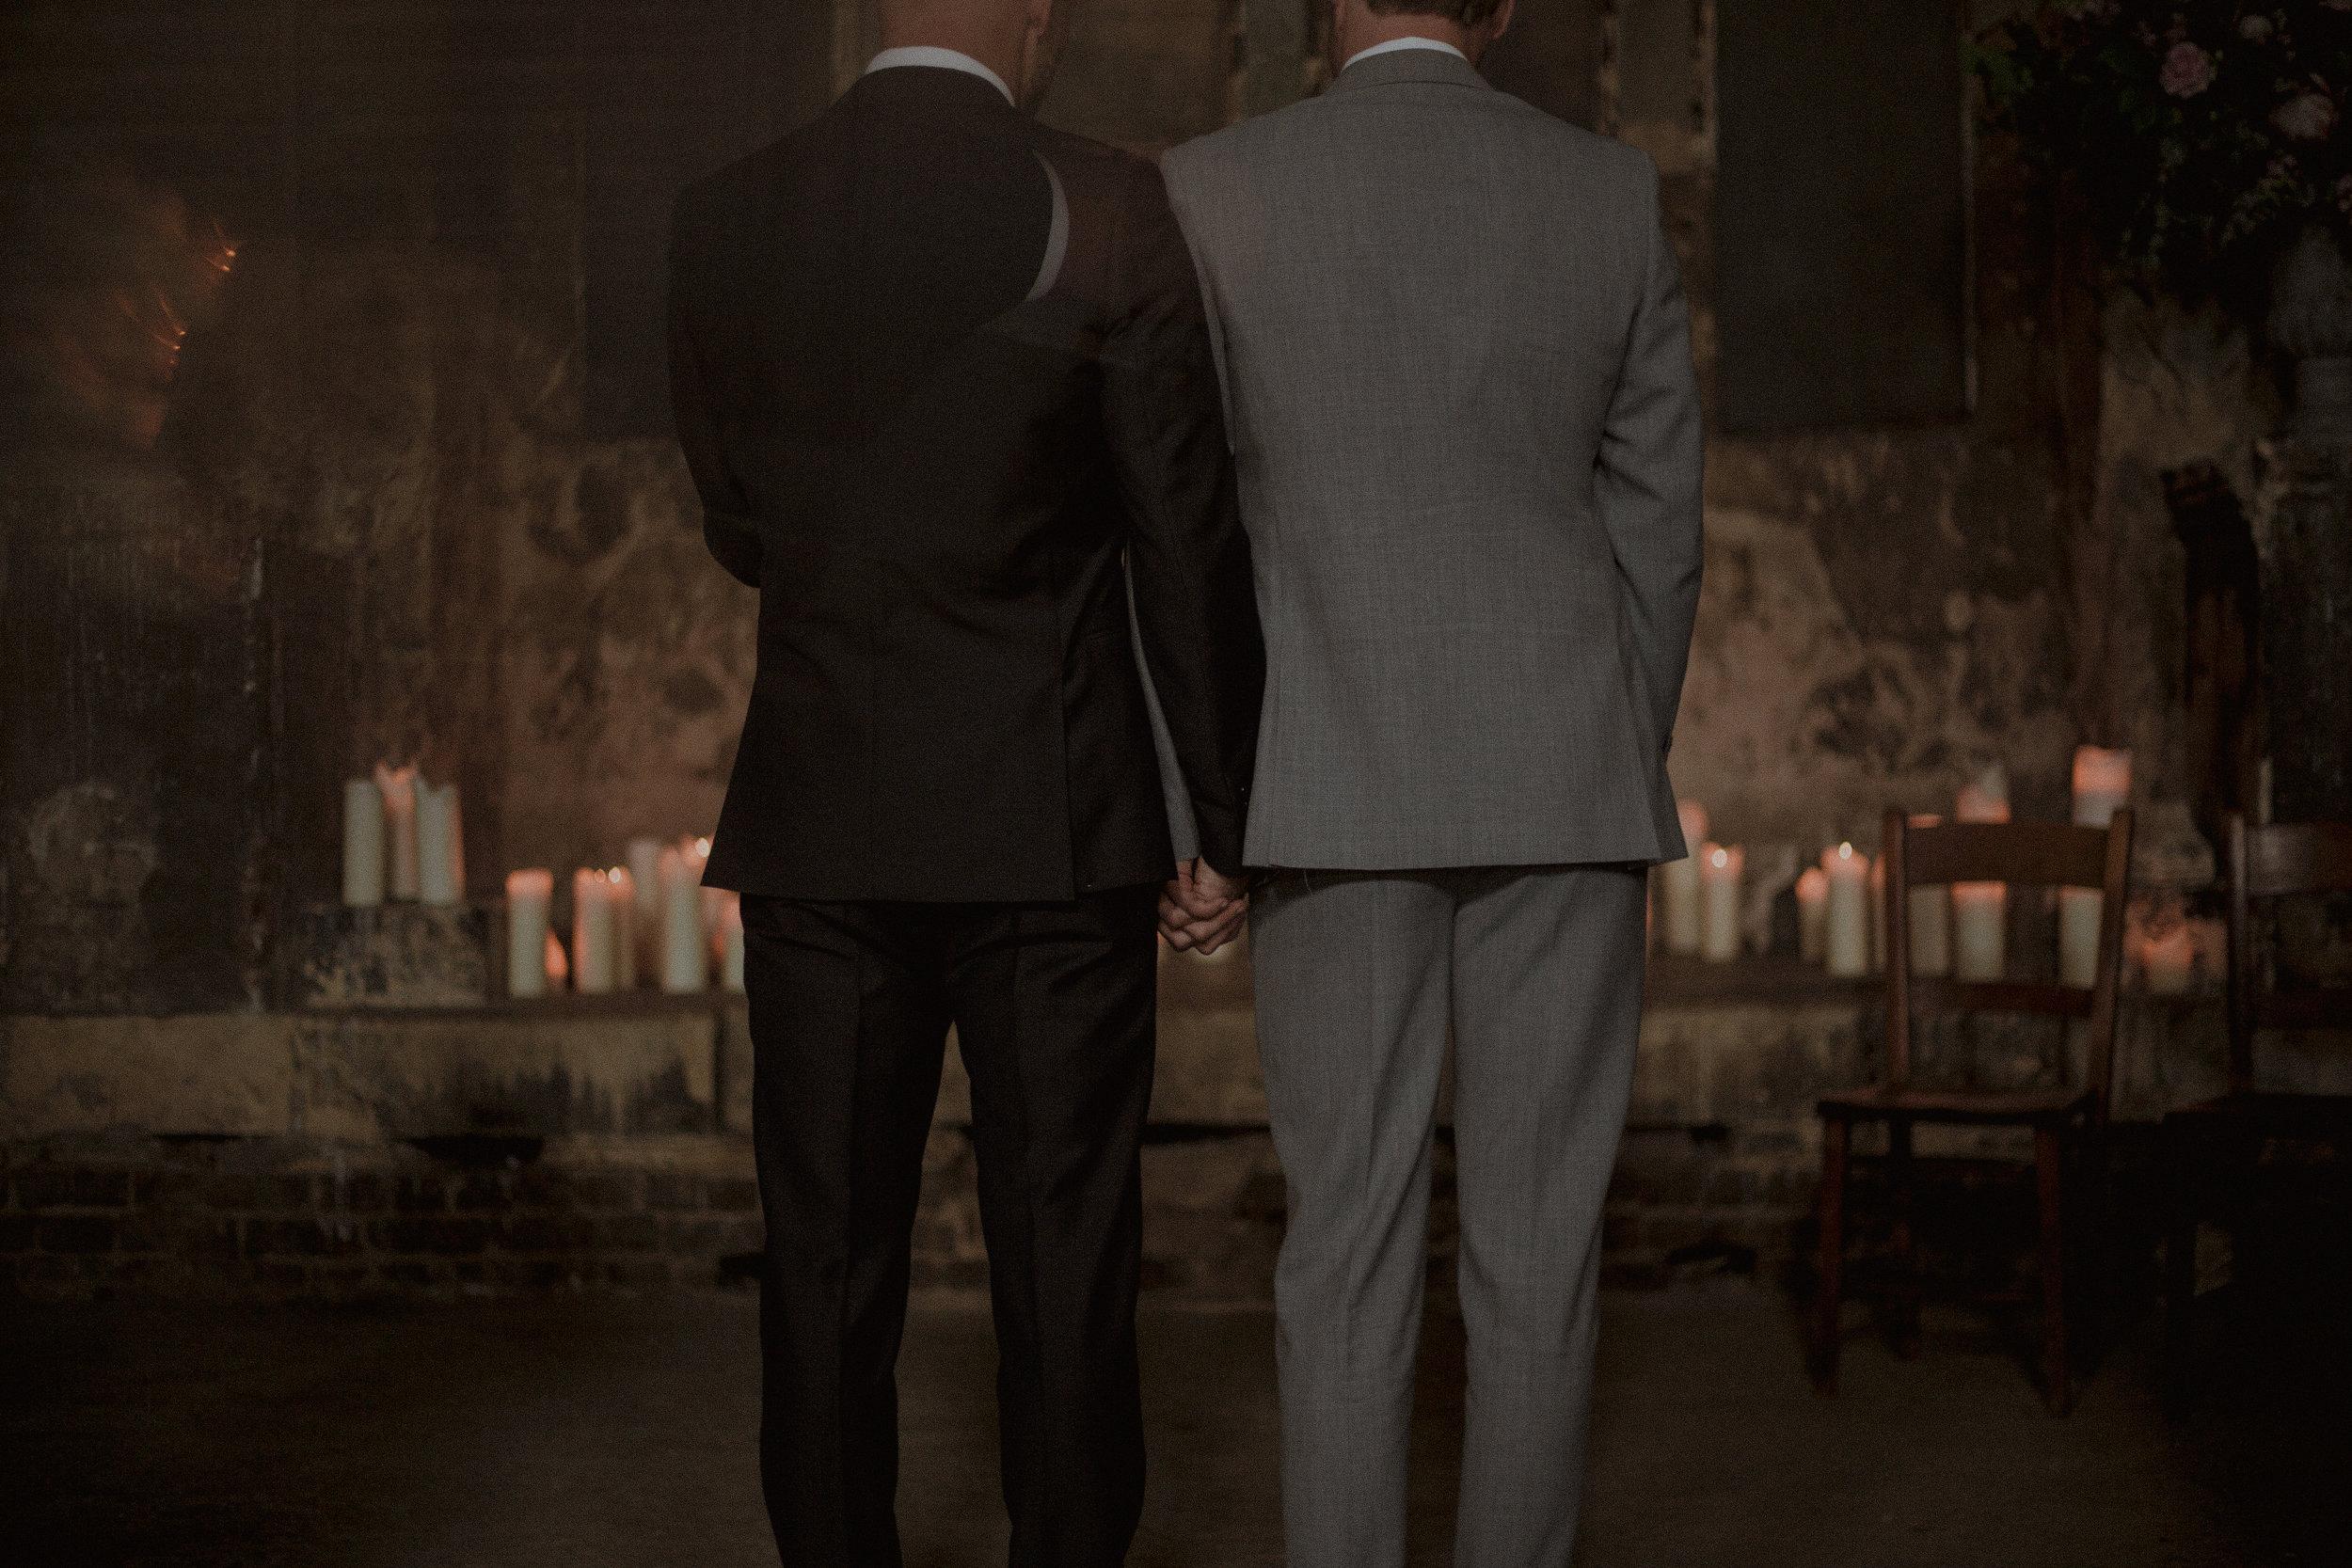 luke-james-wedding-71.jpg